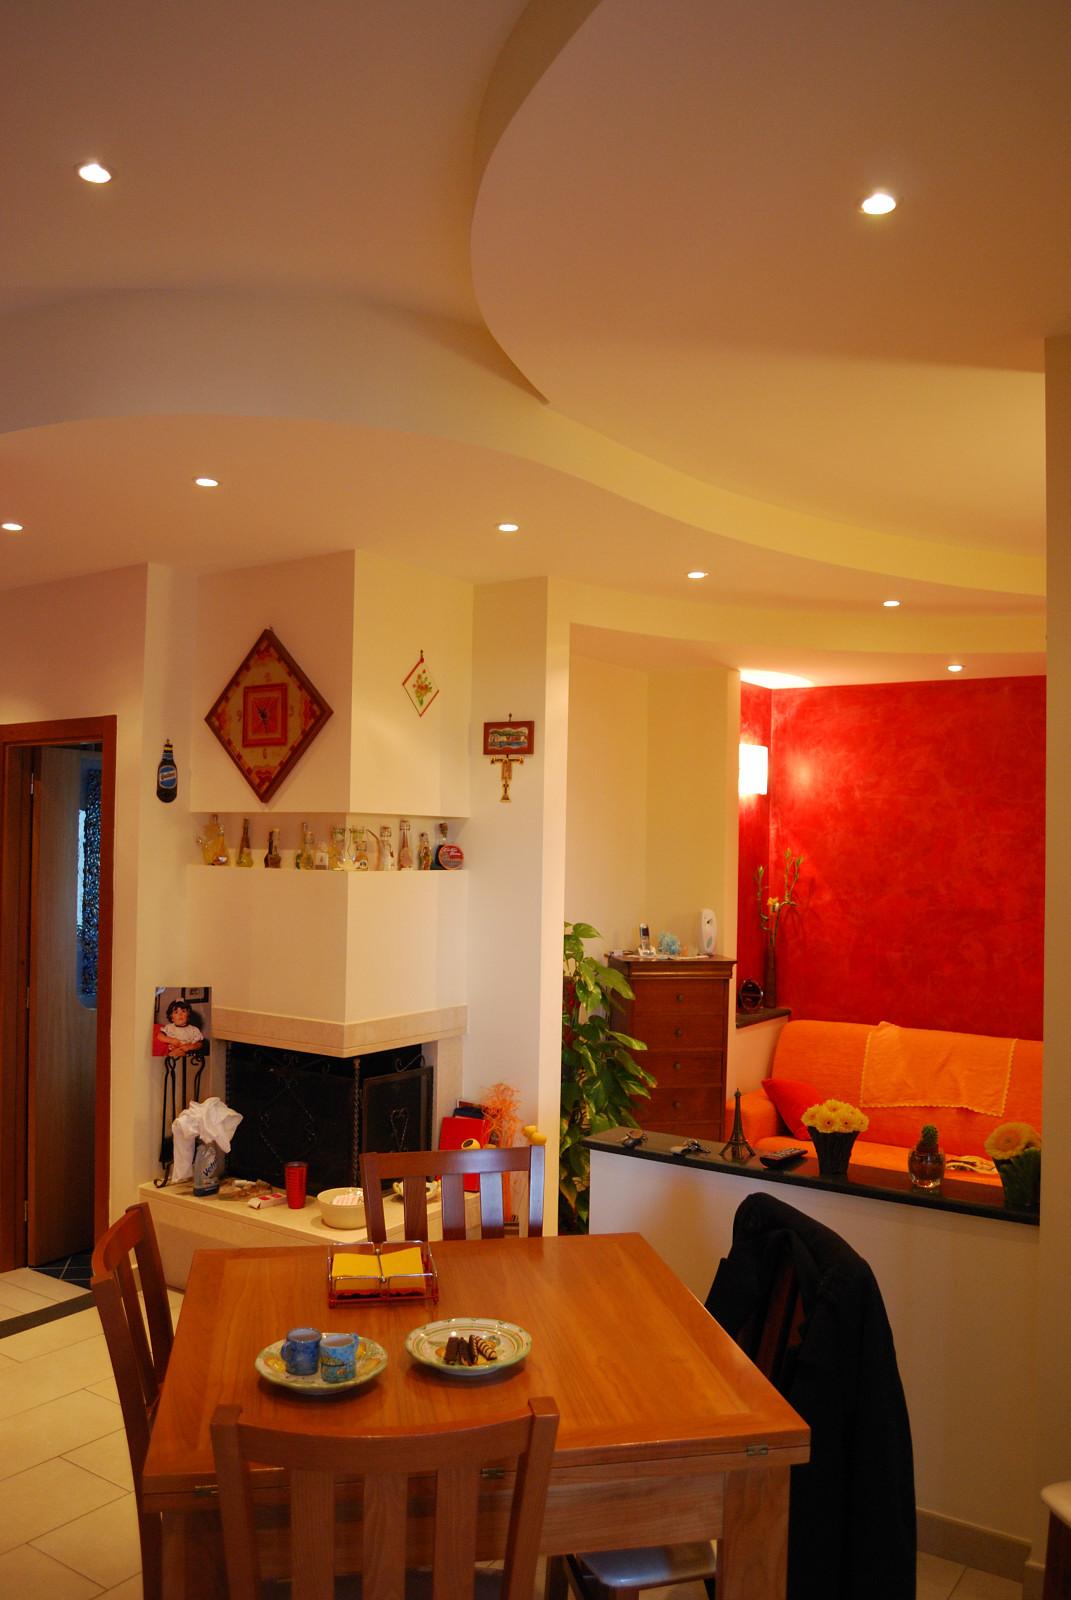 Casa av 06 studio di architettura marco ruocco - Apartamentos avenida ...